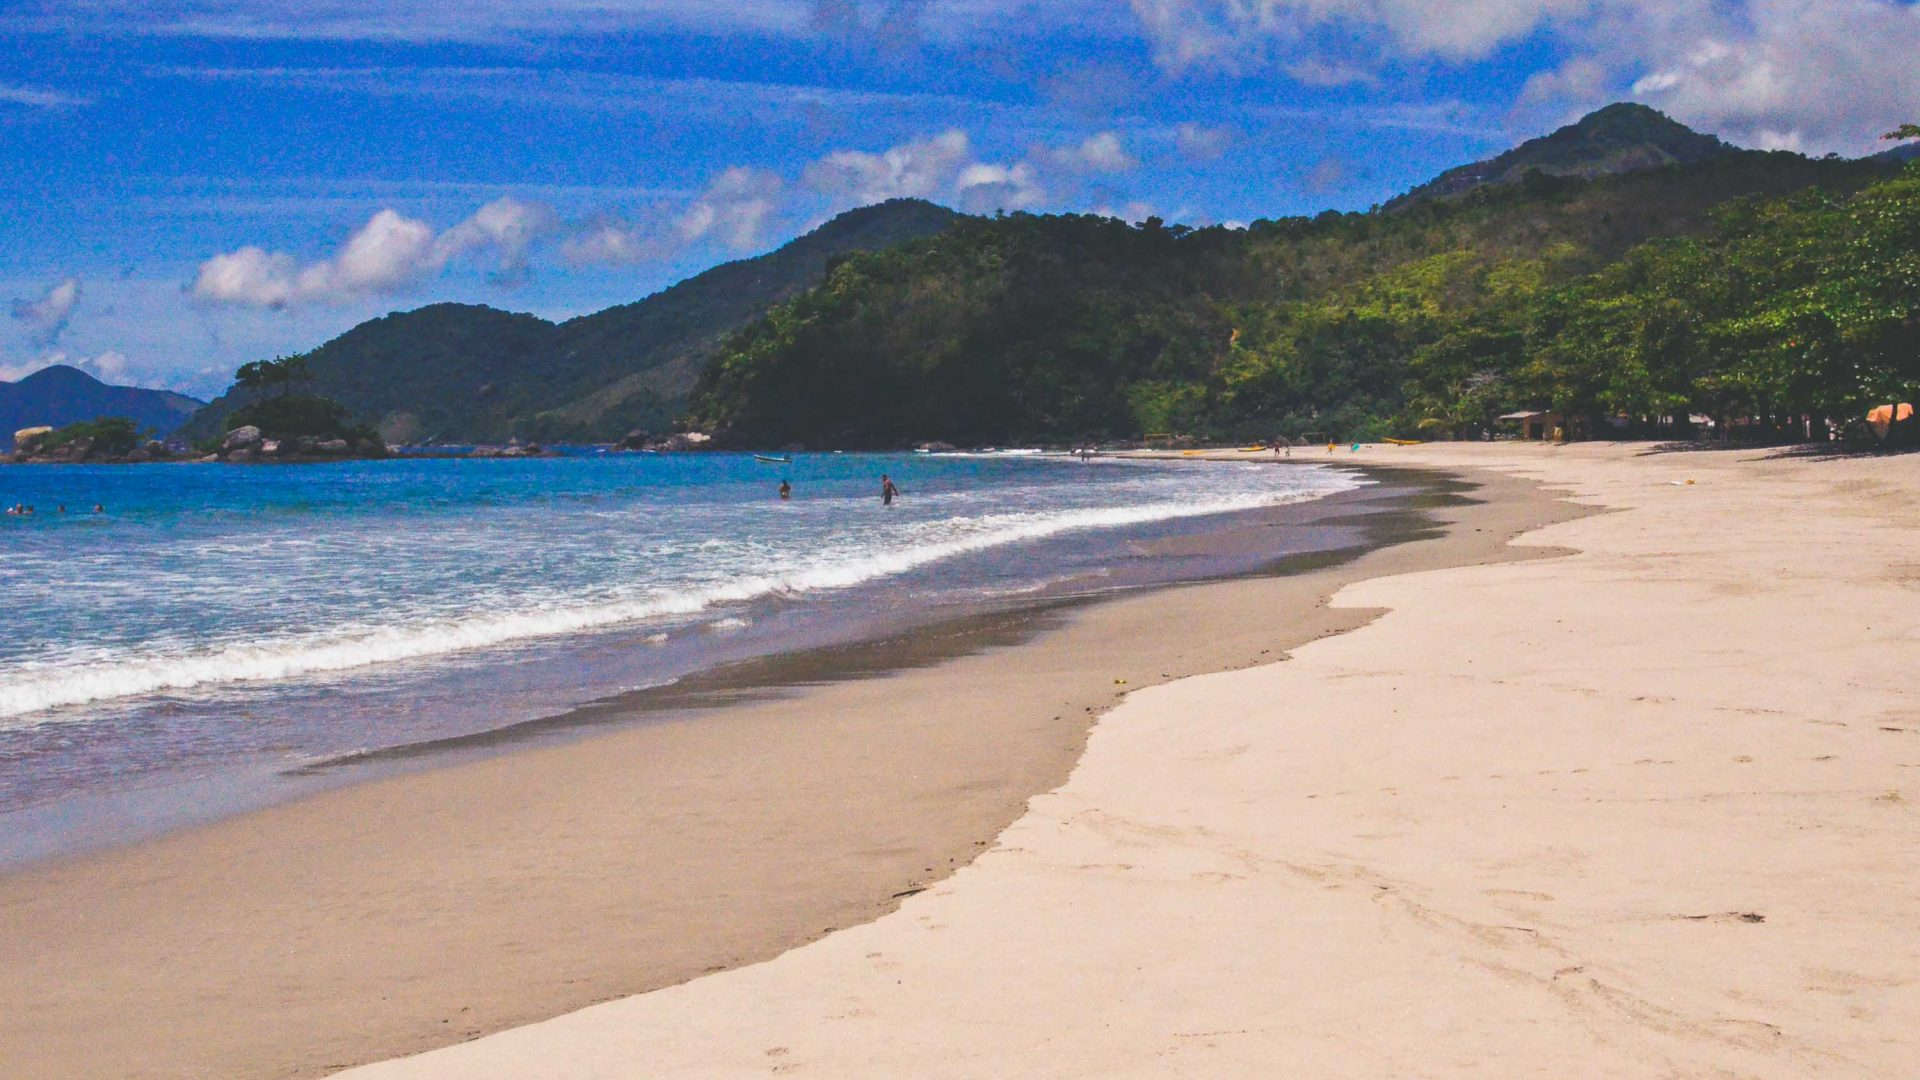 Castelhanos beach in Ilhabela, Brazil.